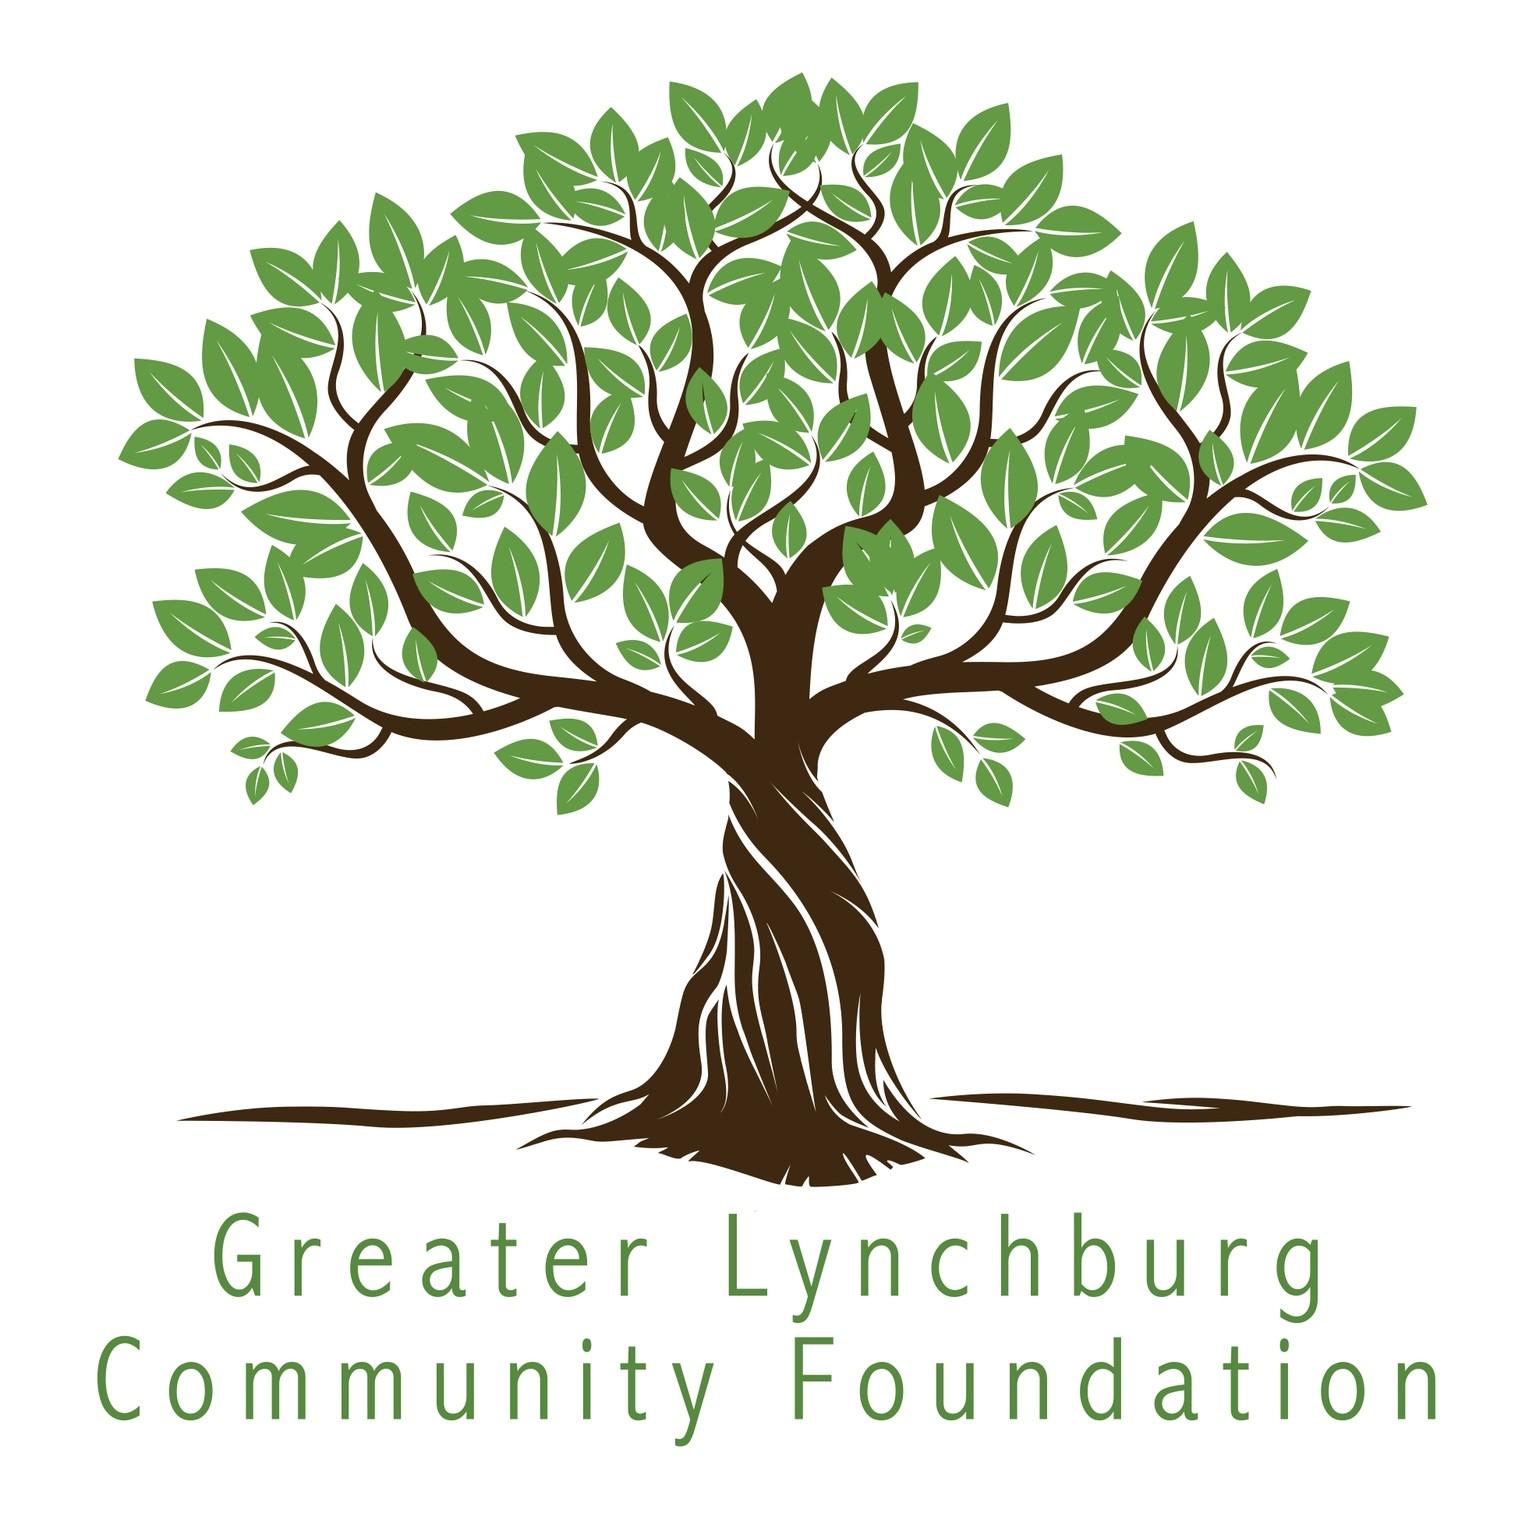 GLCF-Logo_FINAL1 (3).png - January 2018